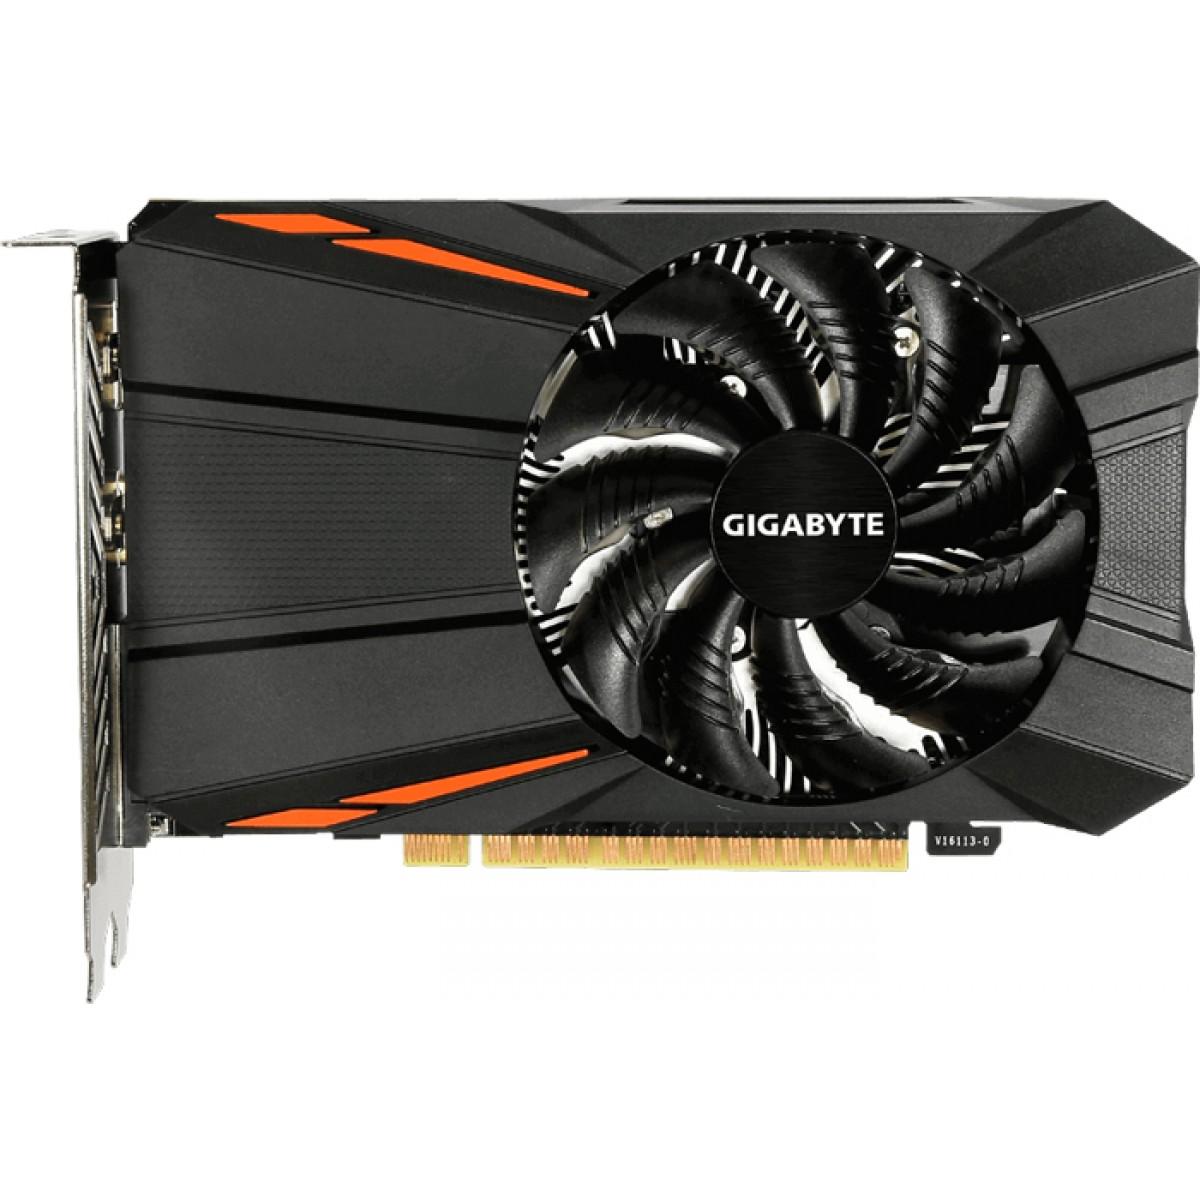 Placa de Vídeo Gigabyte GeForce GTX 1050 D5, 3GB GDDR5, 96Bit, GV-N1050D5-3GD